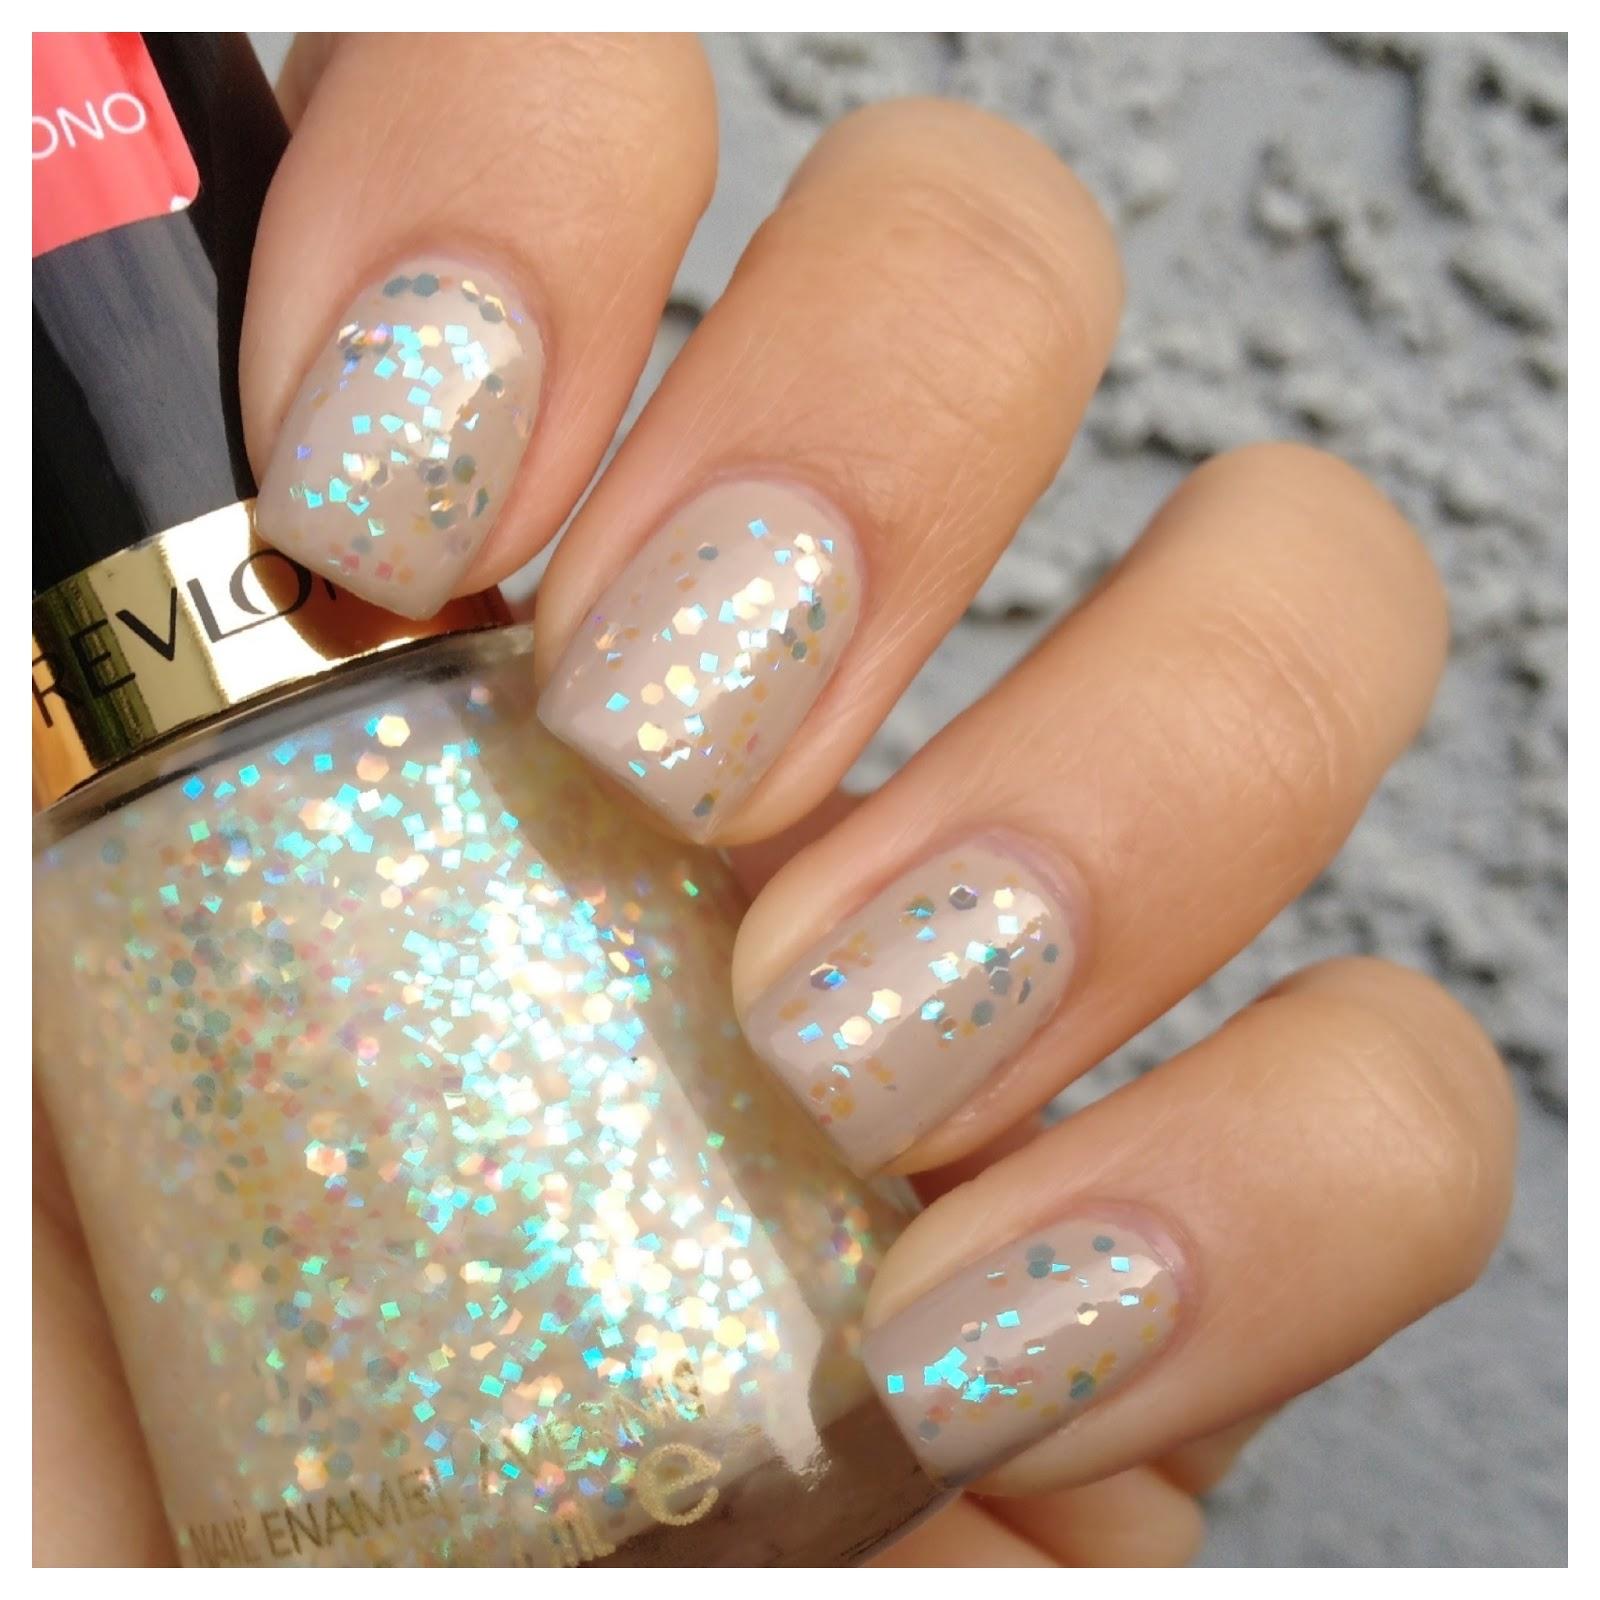 Essie Chunky Glitter Nail Polish - Absolute cycle